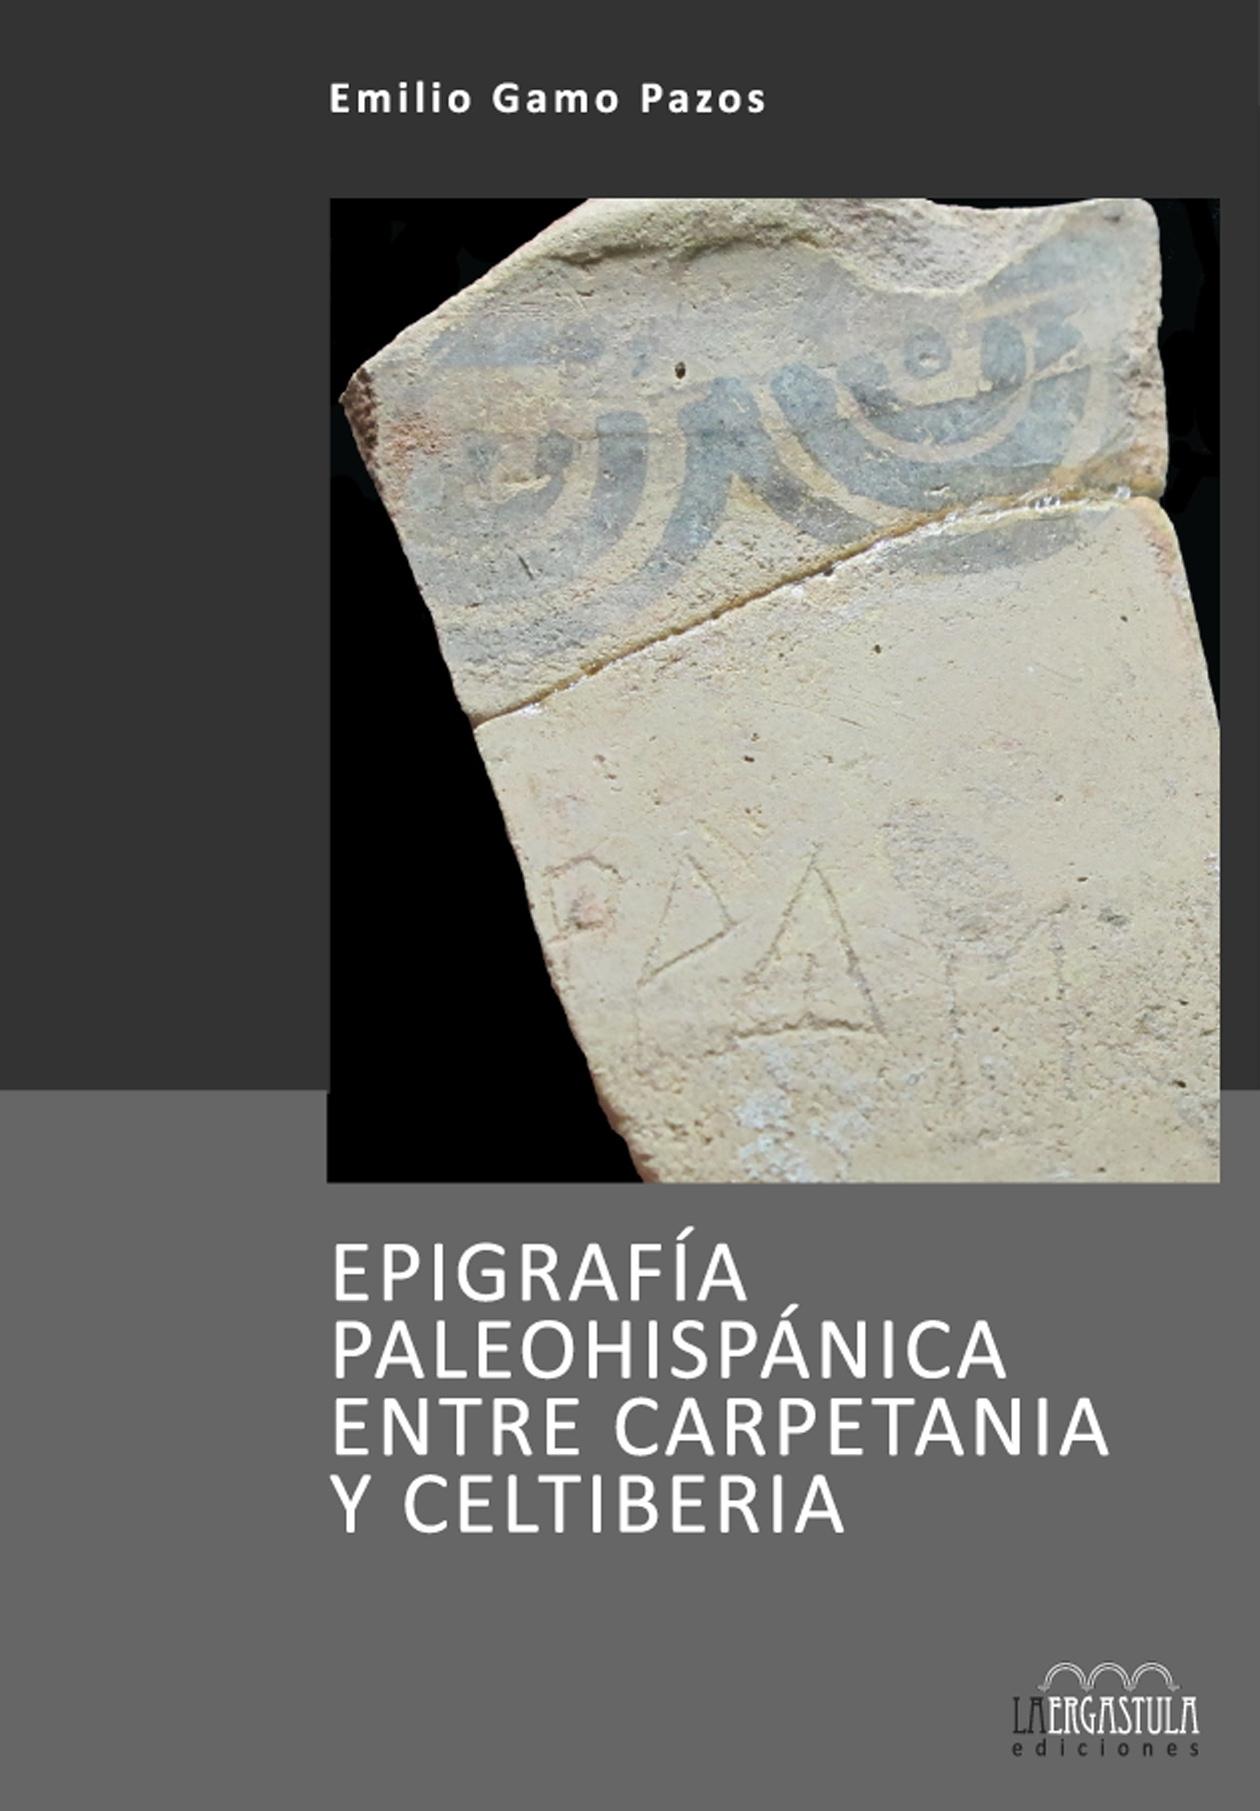 Epigrafía paleohispánica entre Carpetania y Celtiberia